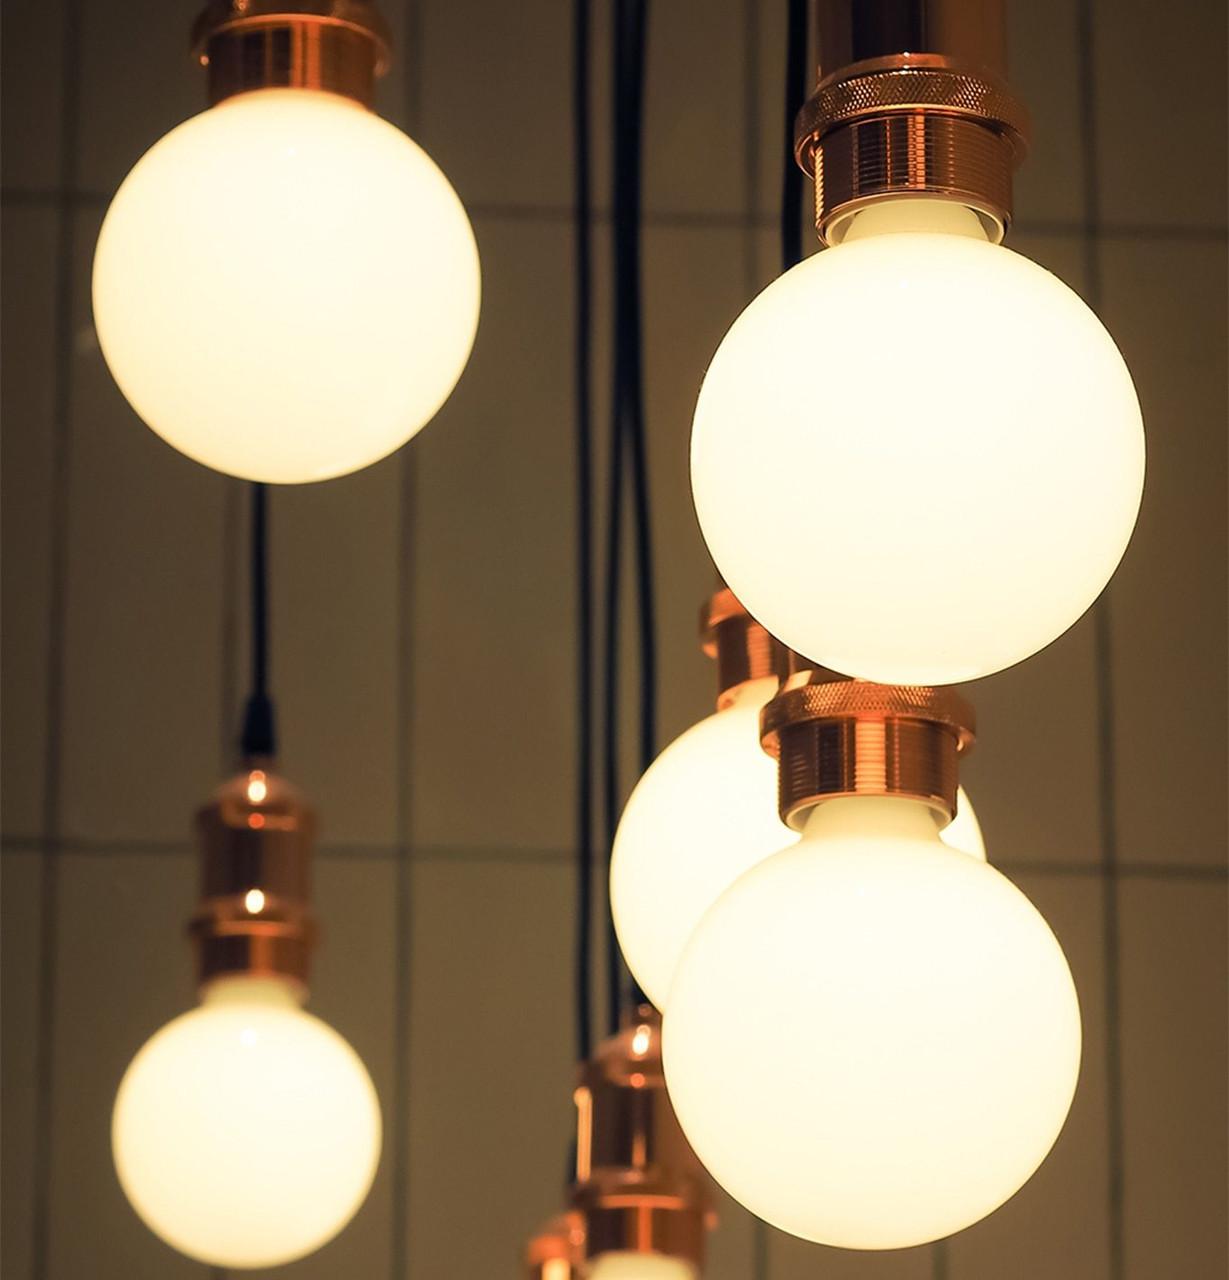 Crompton Lamps LED G95 5W Light Bulbs